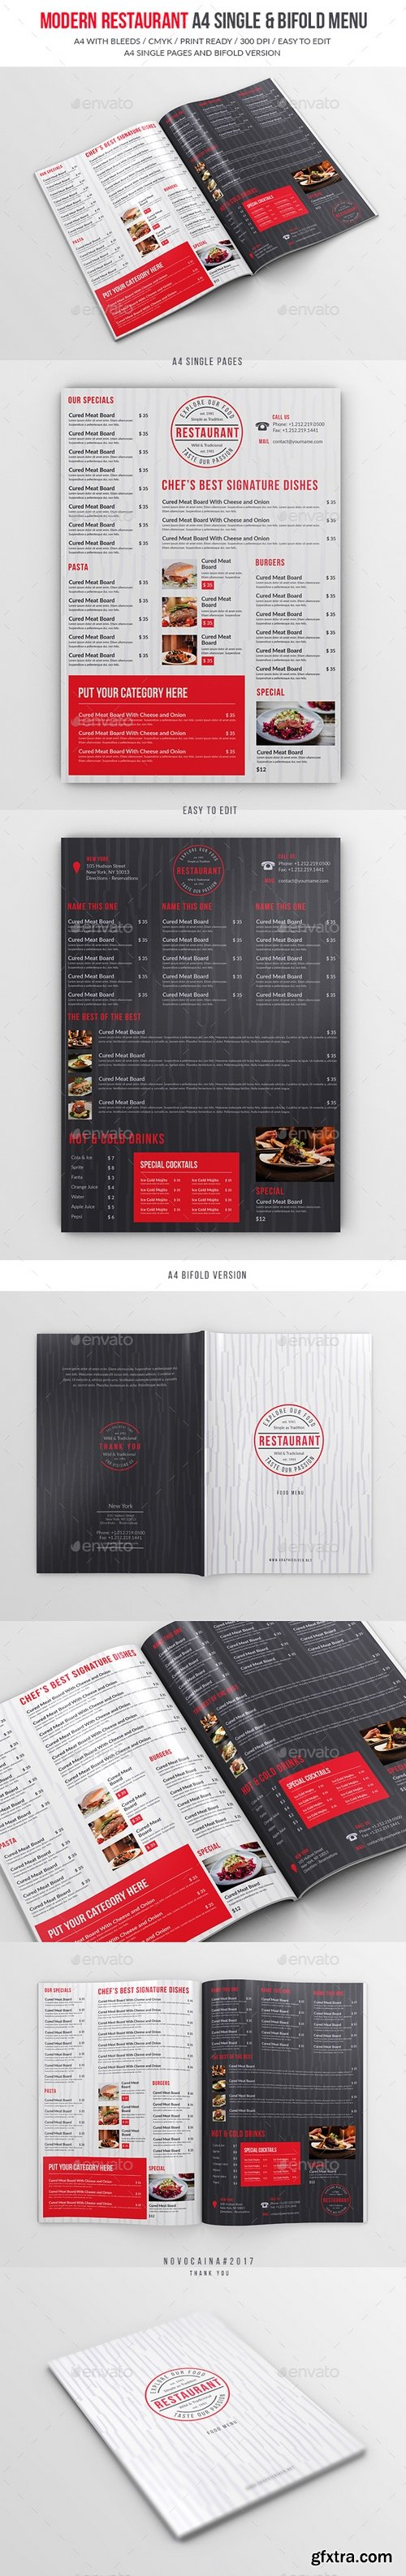 Graphicriver - Modern Restaurant A4 Single And Bifold Menu 19268726